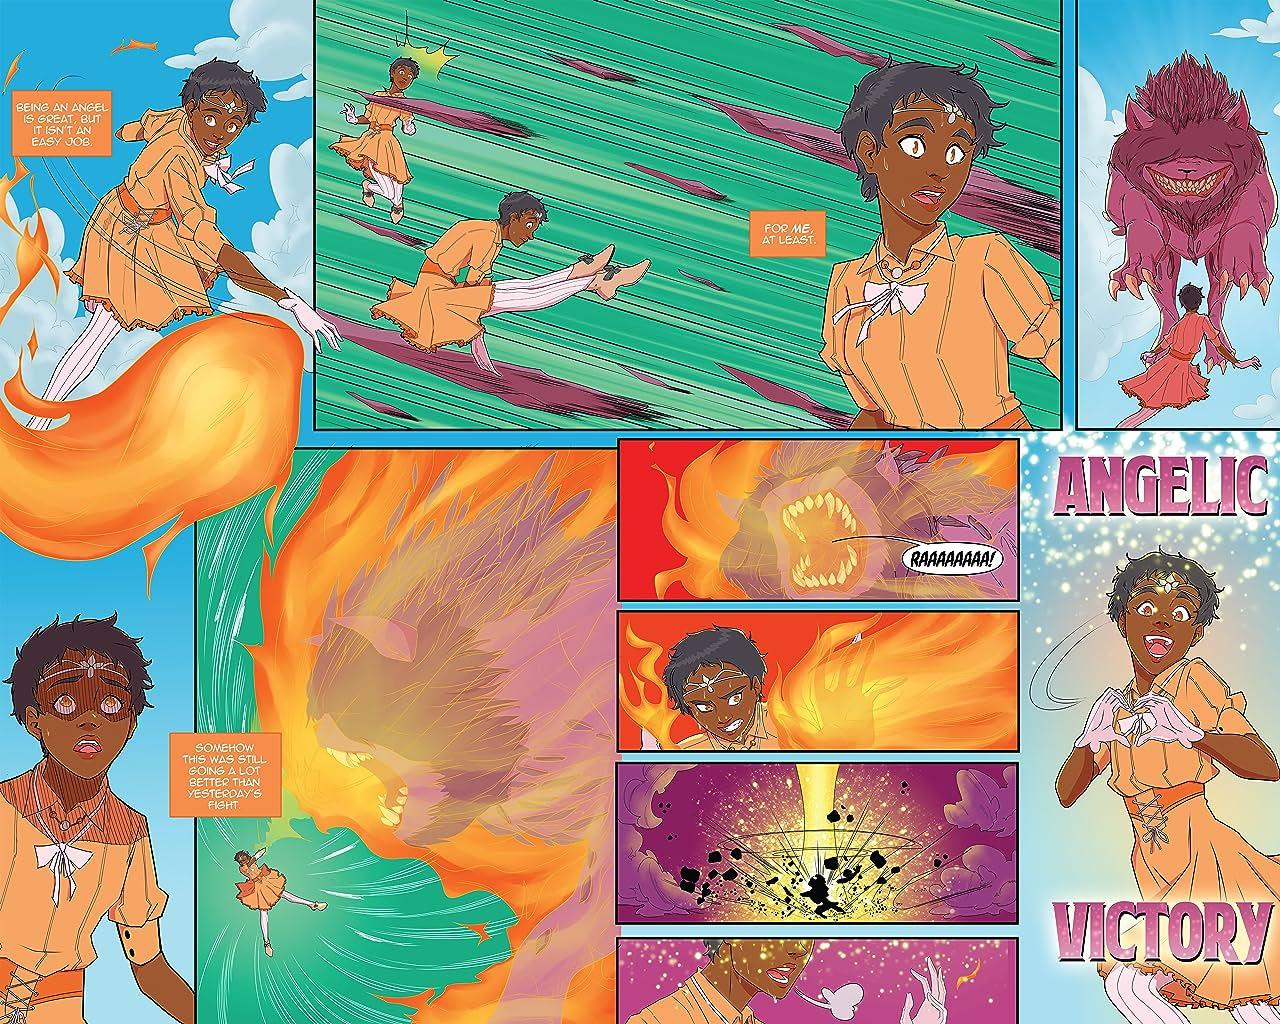 Flame Angel #1